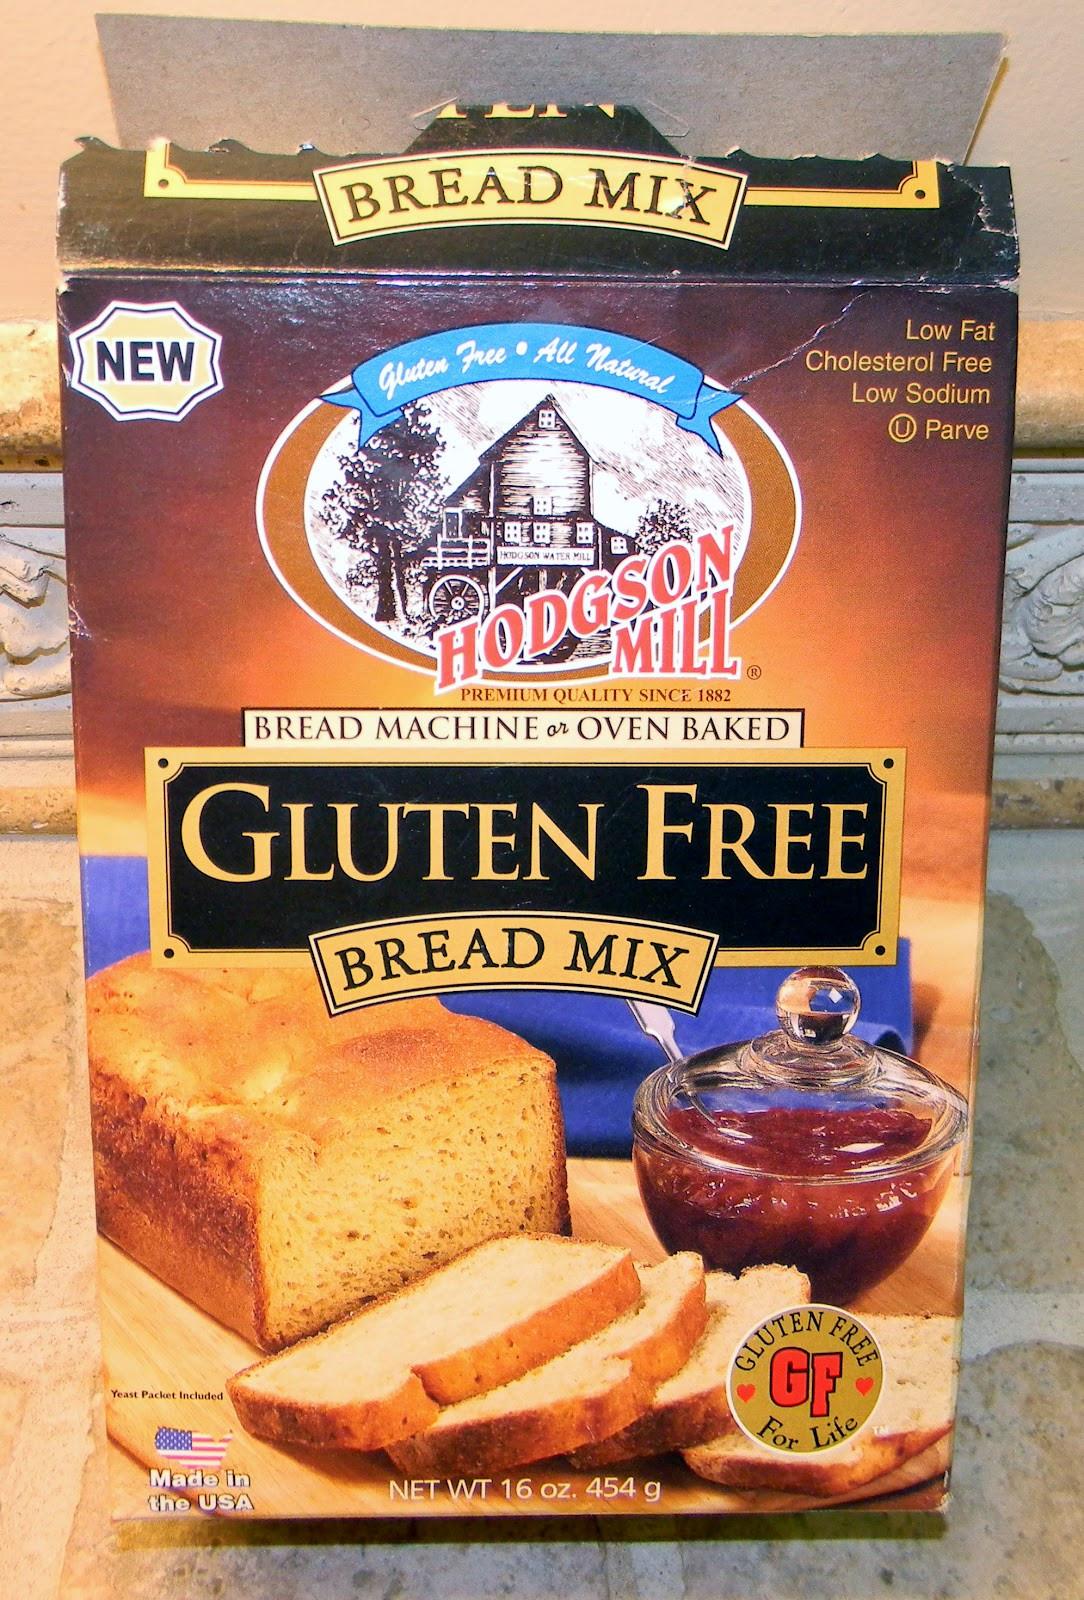 Pamela'S Gluten Free Bread Mix  4 U Gluten Free My First Loaf of Bread in New Bread Machine